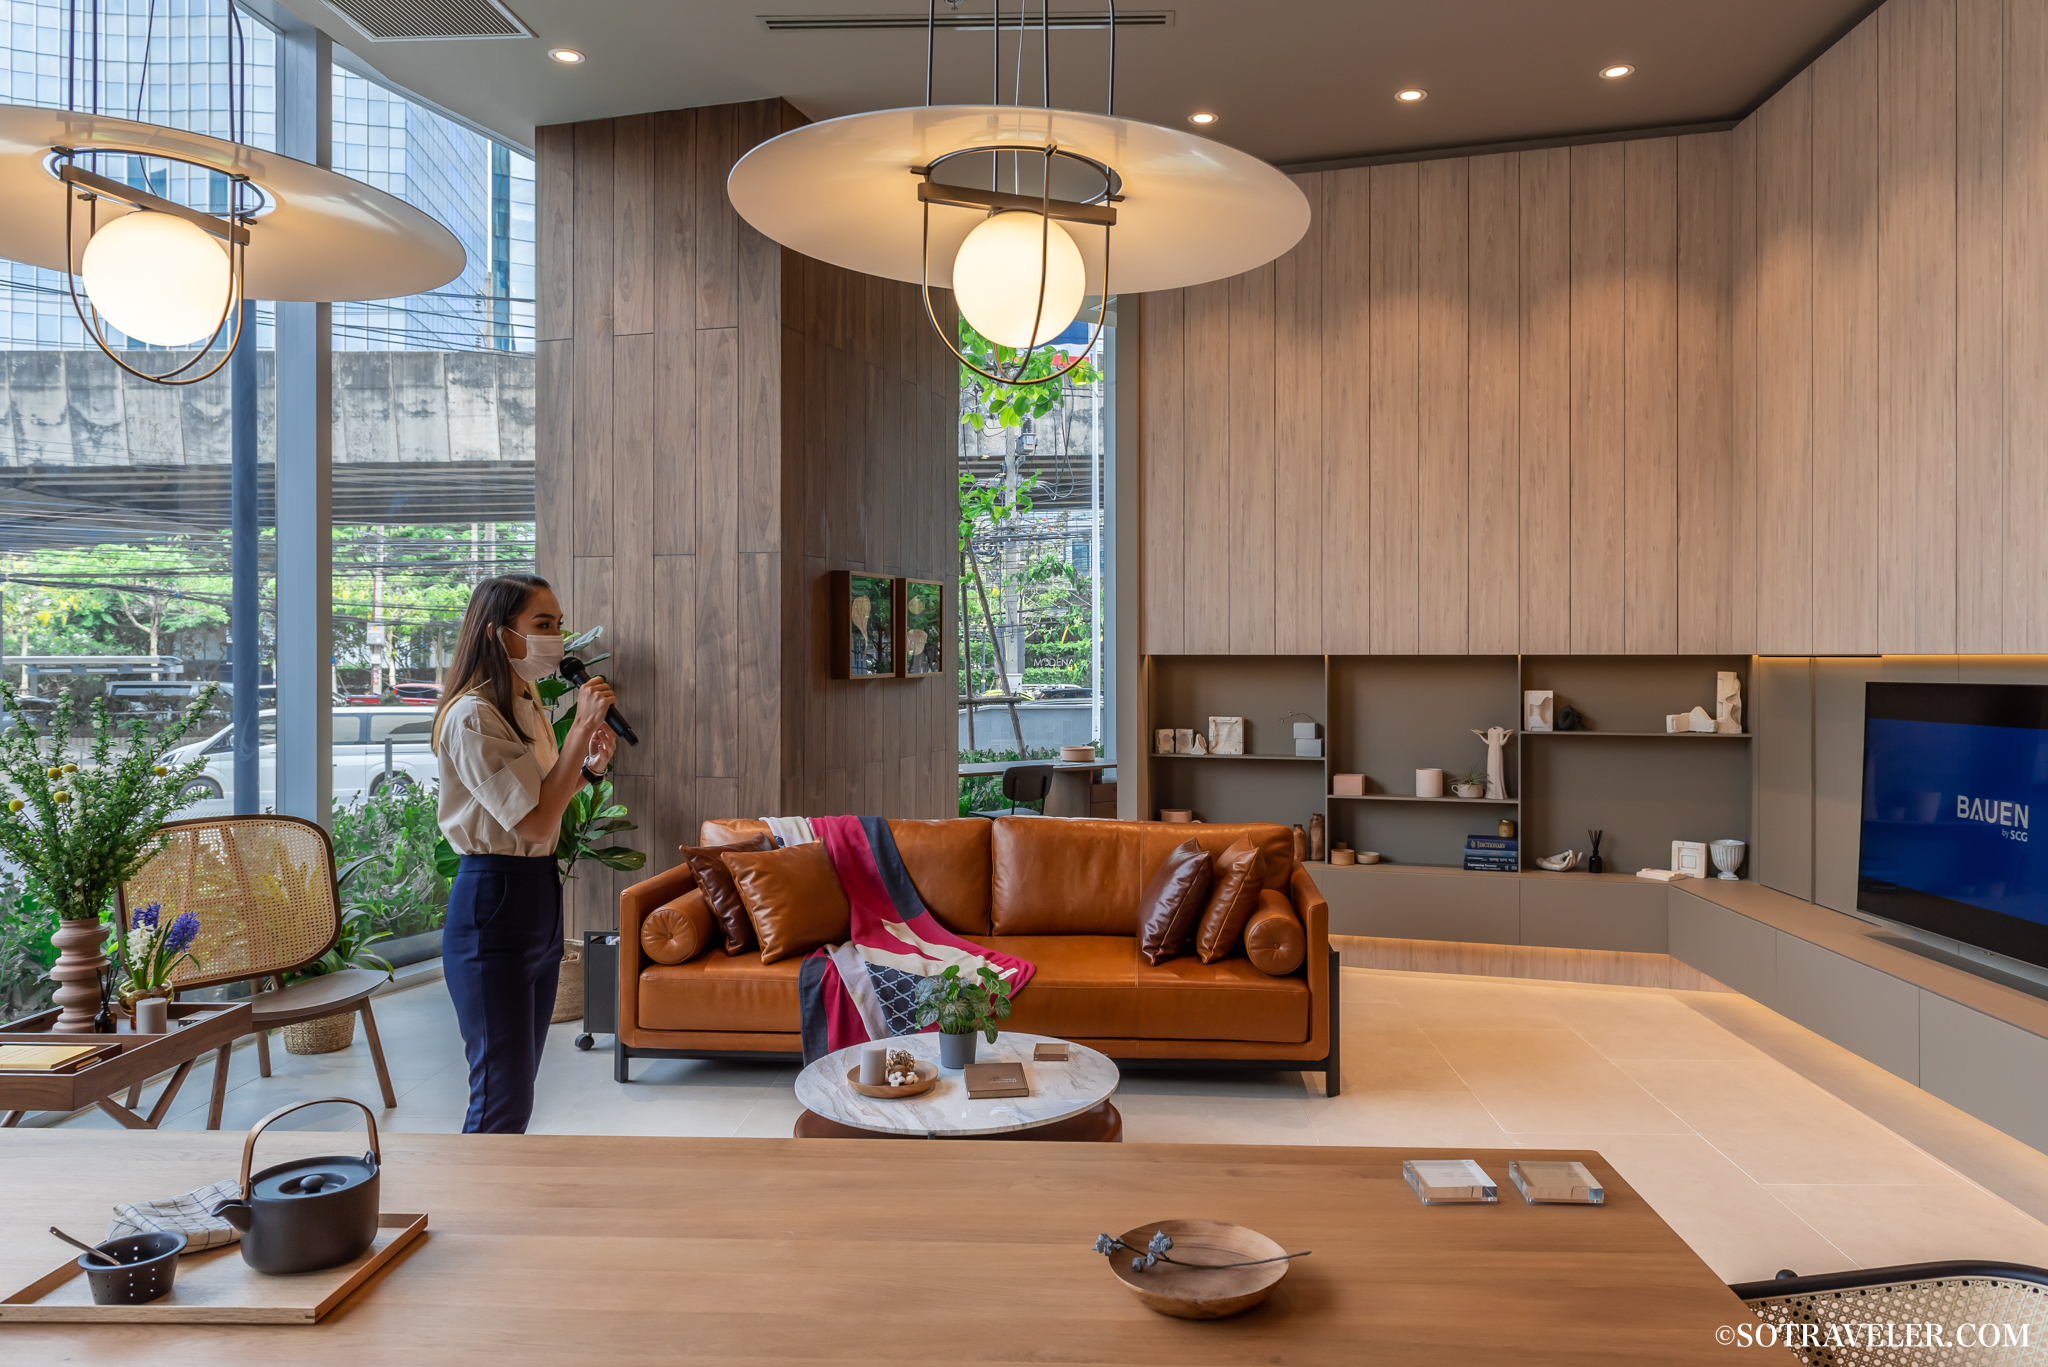 BAUEN by SCG Renovate Home